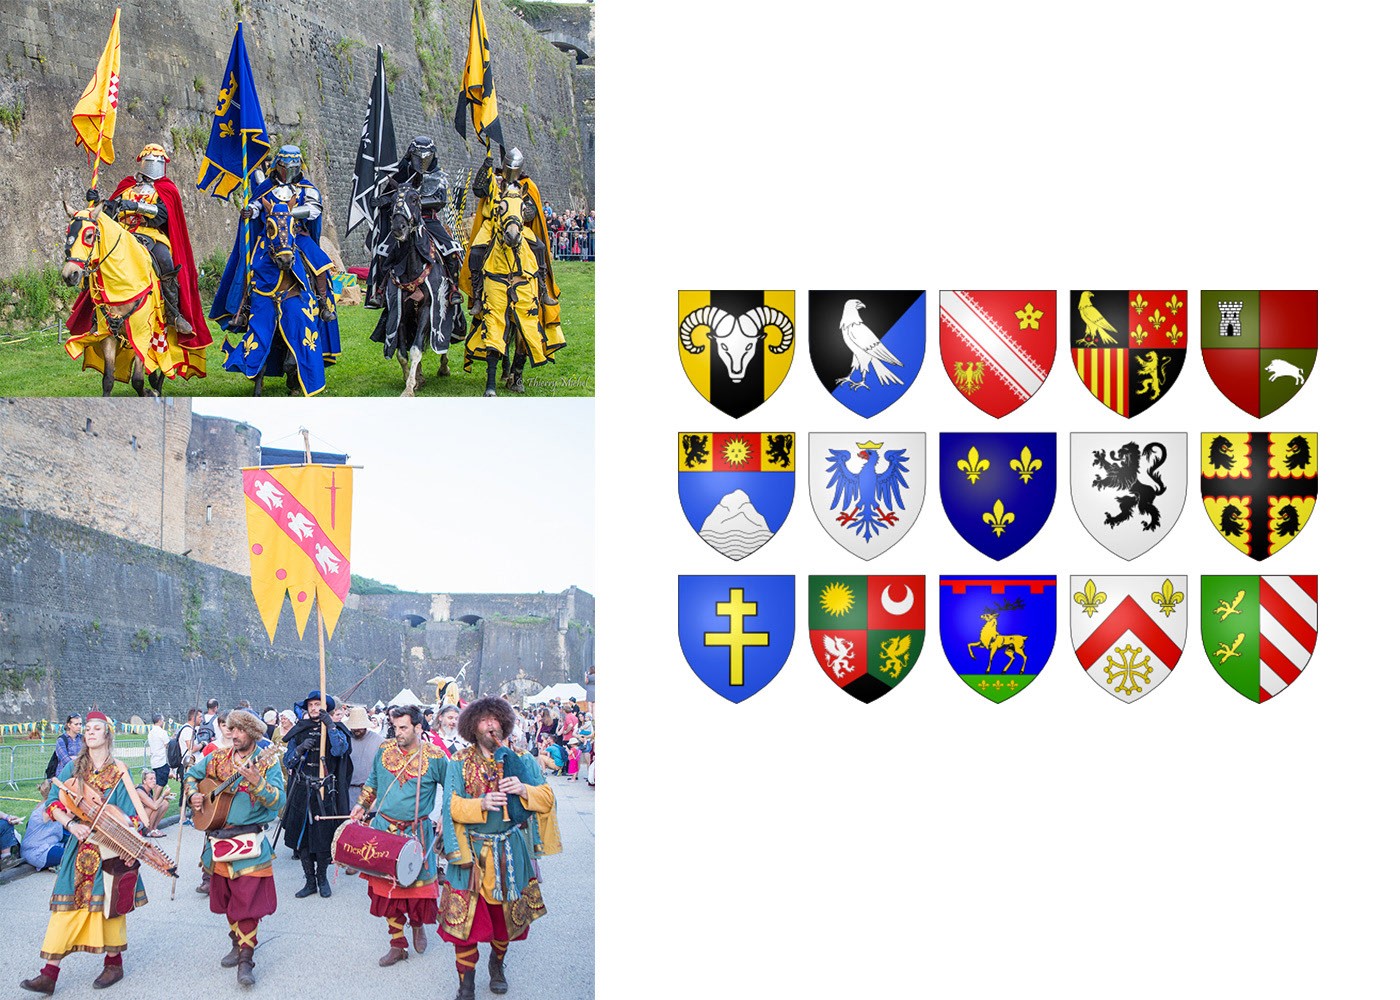 Festival médiéval Sedan blasons